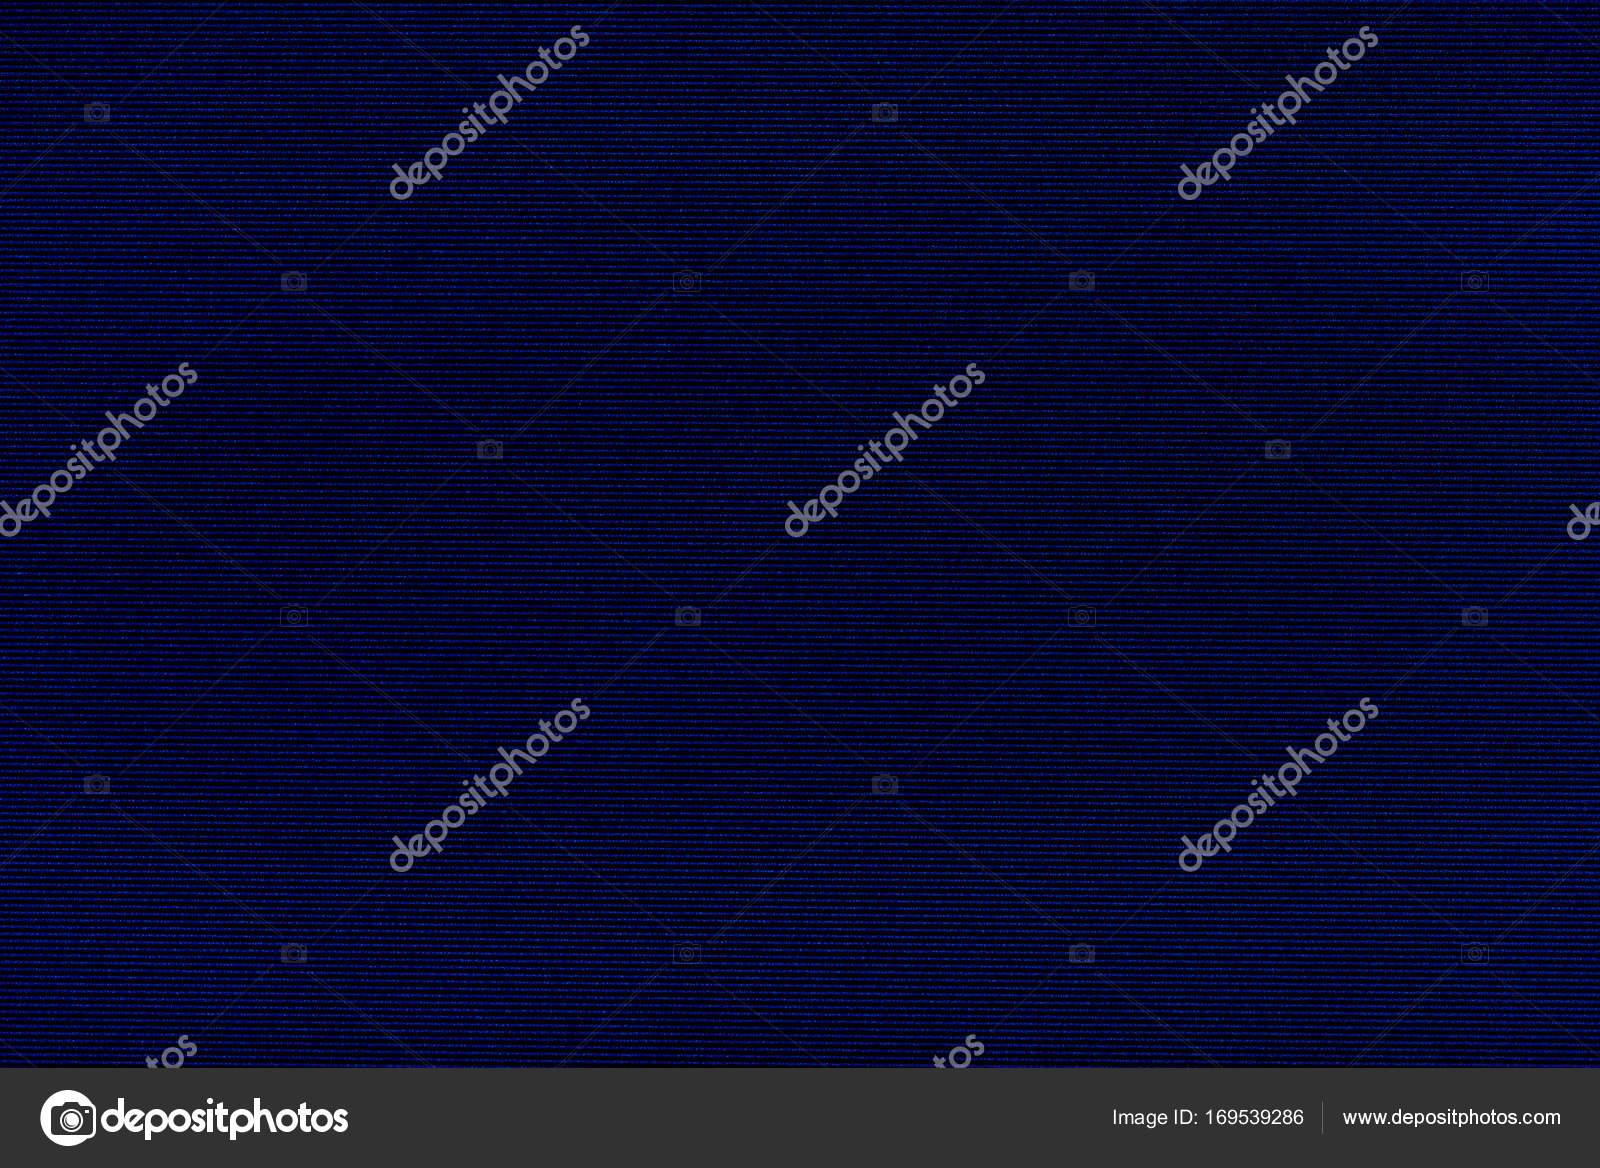 blue velvet texture. Close Up View Of Dark Blue Velvet Fabric Texture \u2014 Photo By VadimVasenin